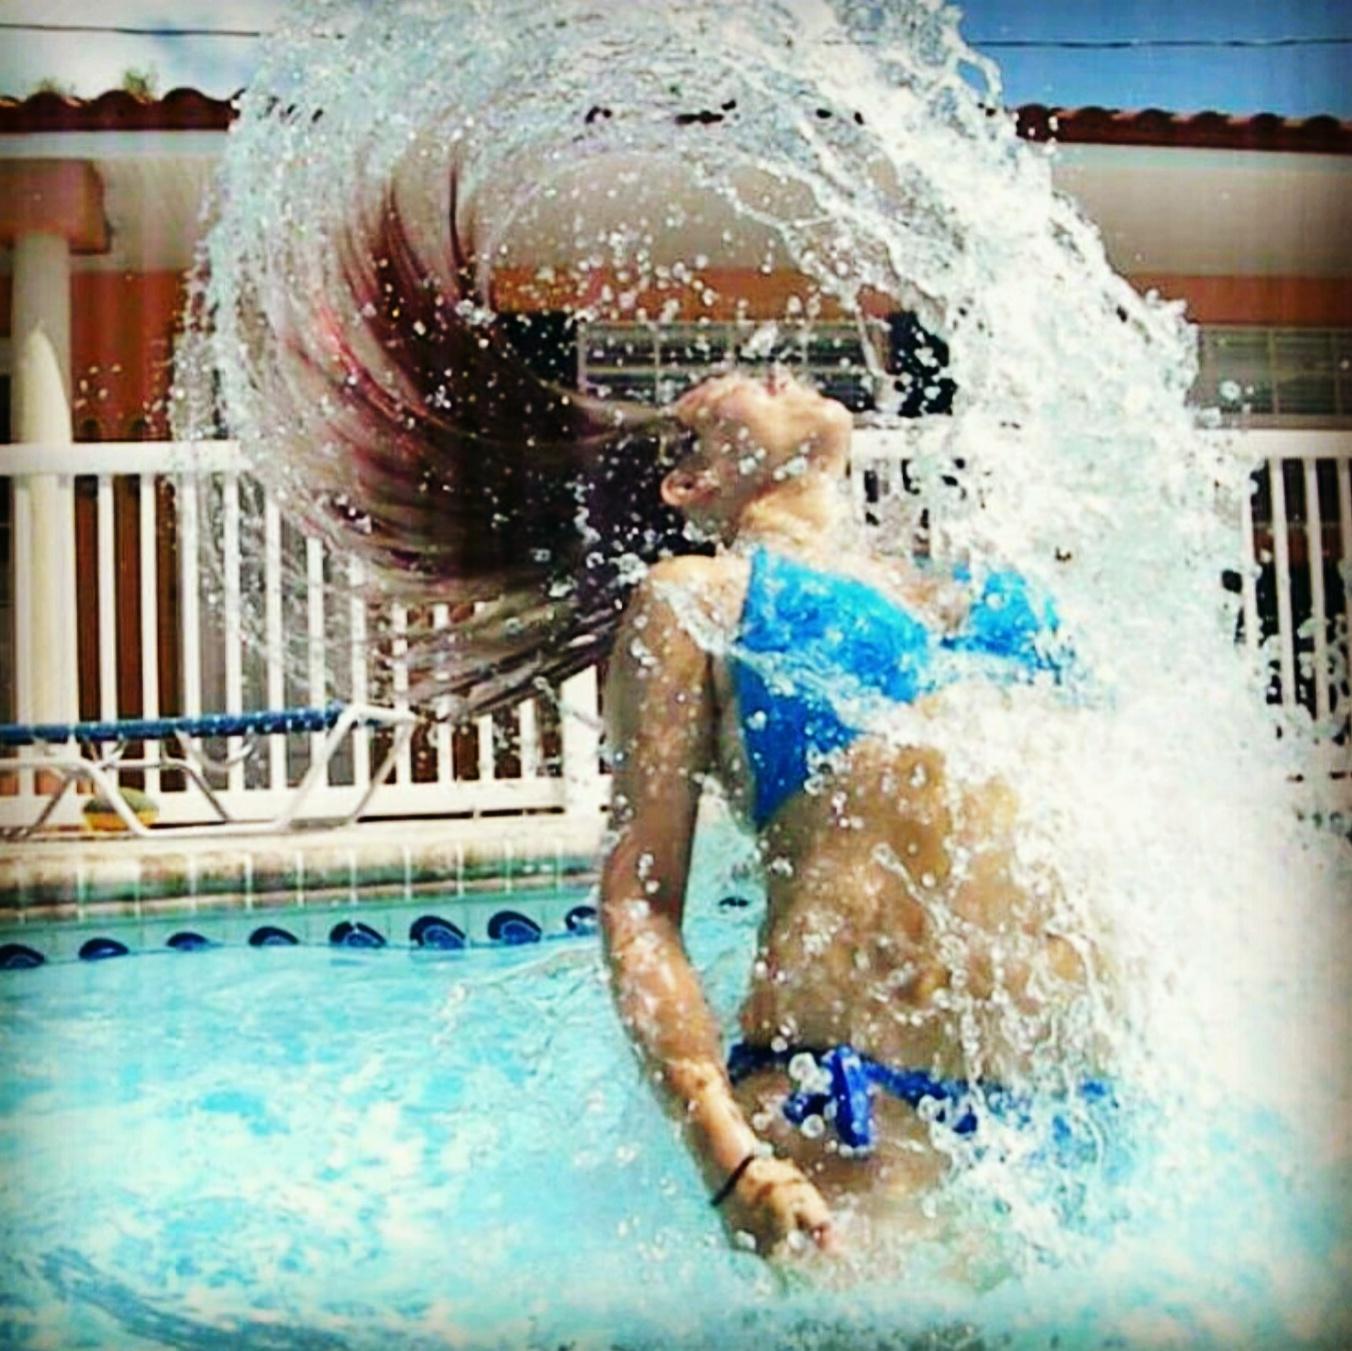 Disney Princess Boot Camp The Little Mermaid Ariel fitness nerd post